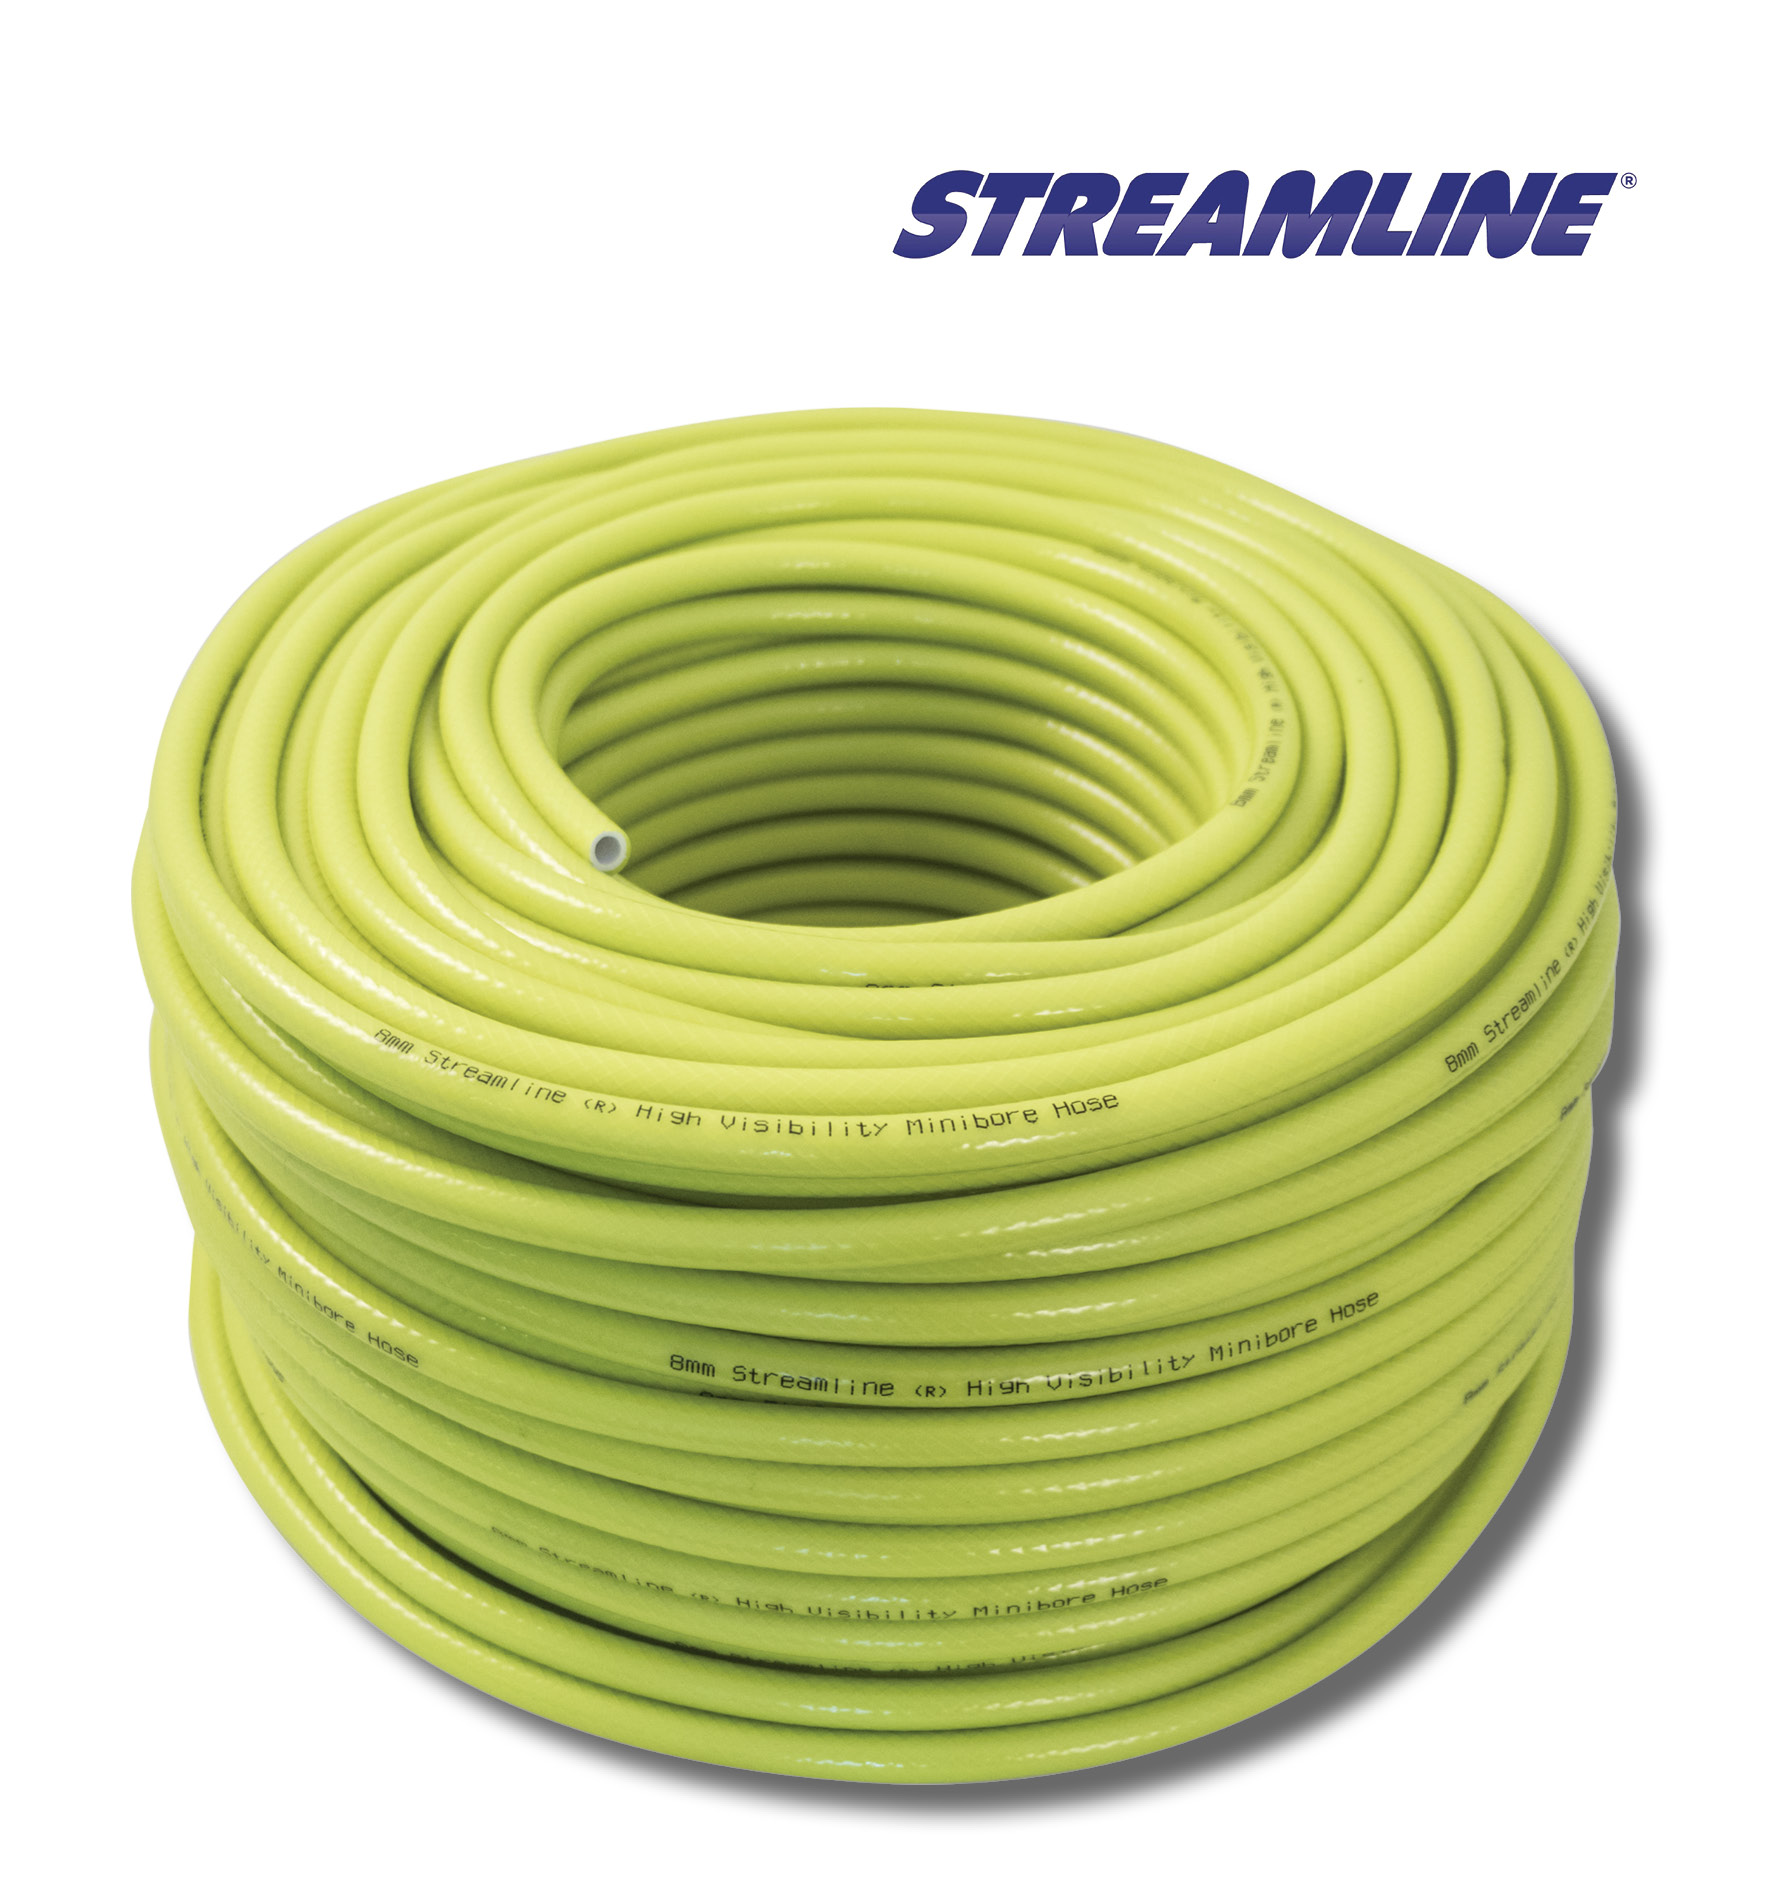 Steamline 8mm Minibore Hot & Cold Water Hi Viz Hose 100 Metres